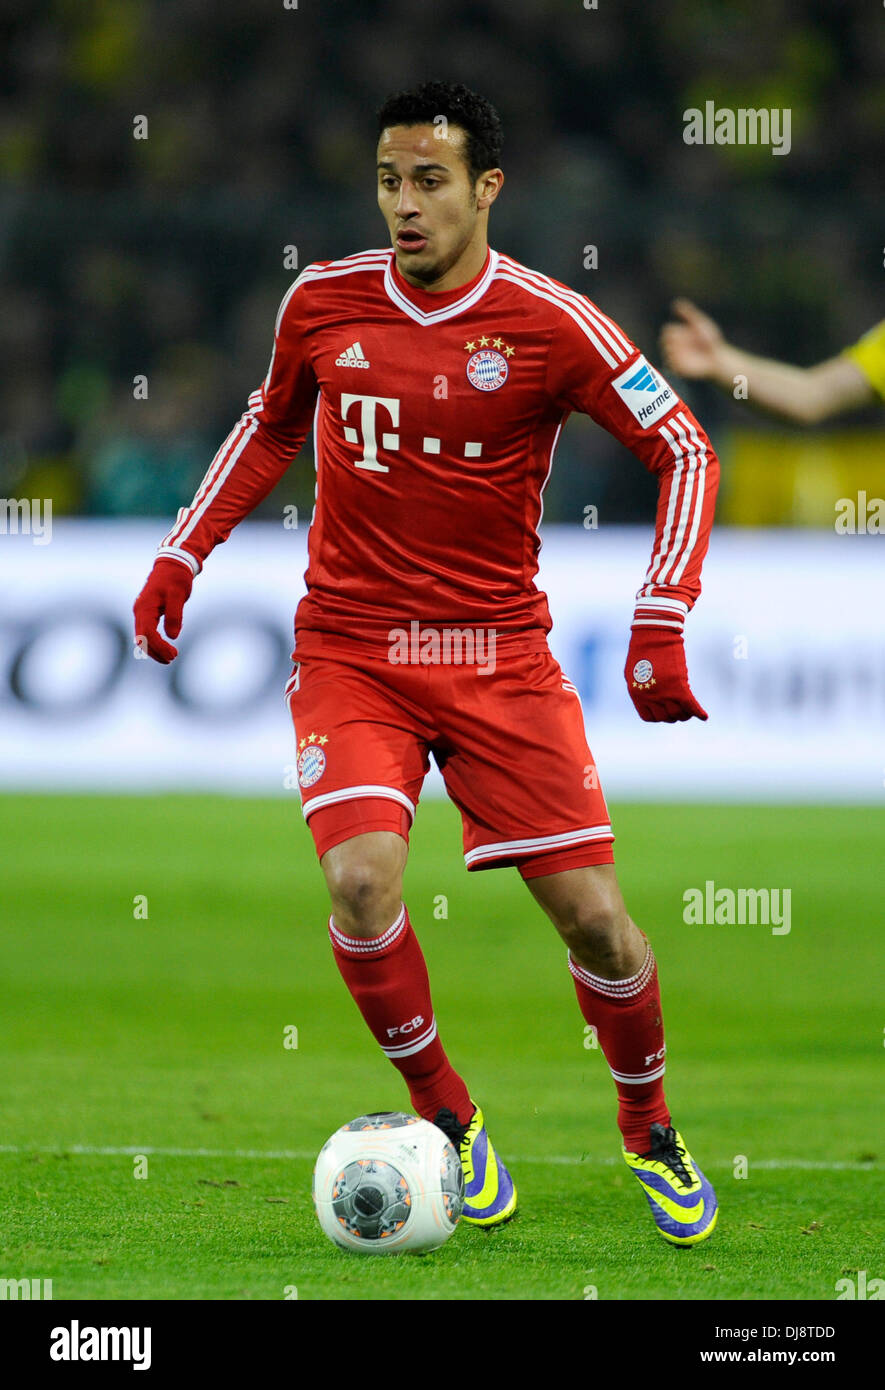 Dortmund, Germany November 23rd 2013, German Football Bundesliga Season 2013/14 matchday 13, Borussia Dortmund (BVB) vs.  FC Bayern Munich (Muenchen, Munchen, FCB) 3:0 --- Thiago Alcantara (Bayern) - Stock Image